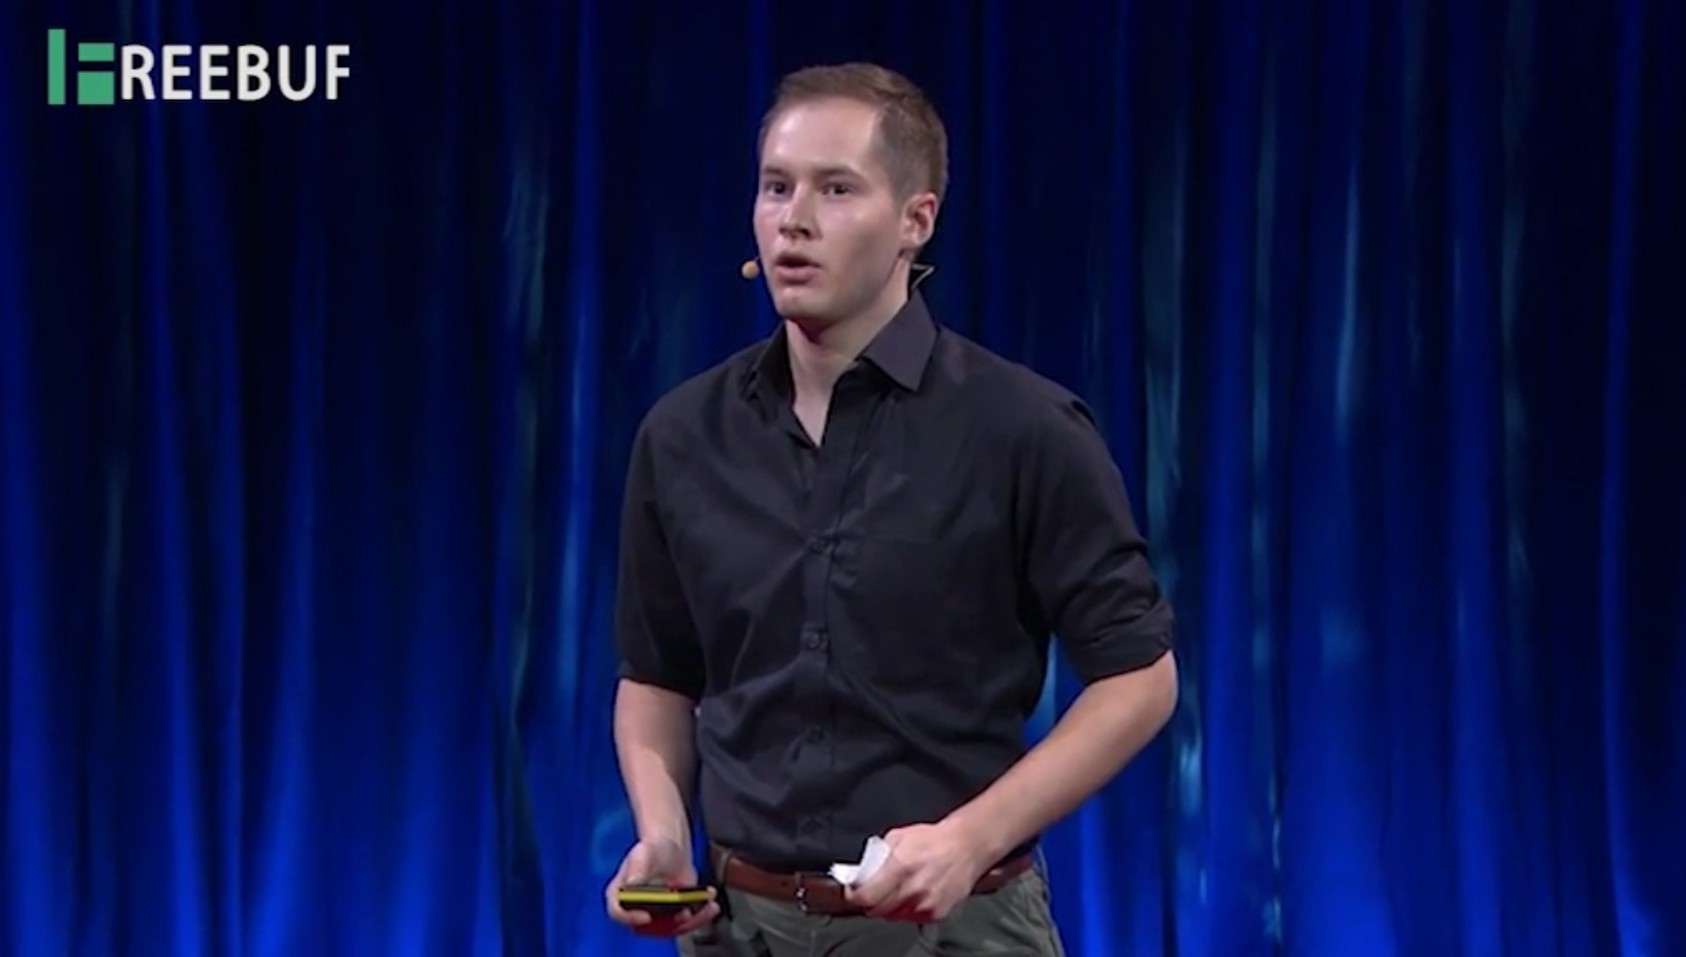 FreeBuf公开课•TED系列:现代网络战需要黑客